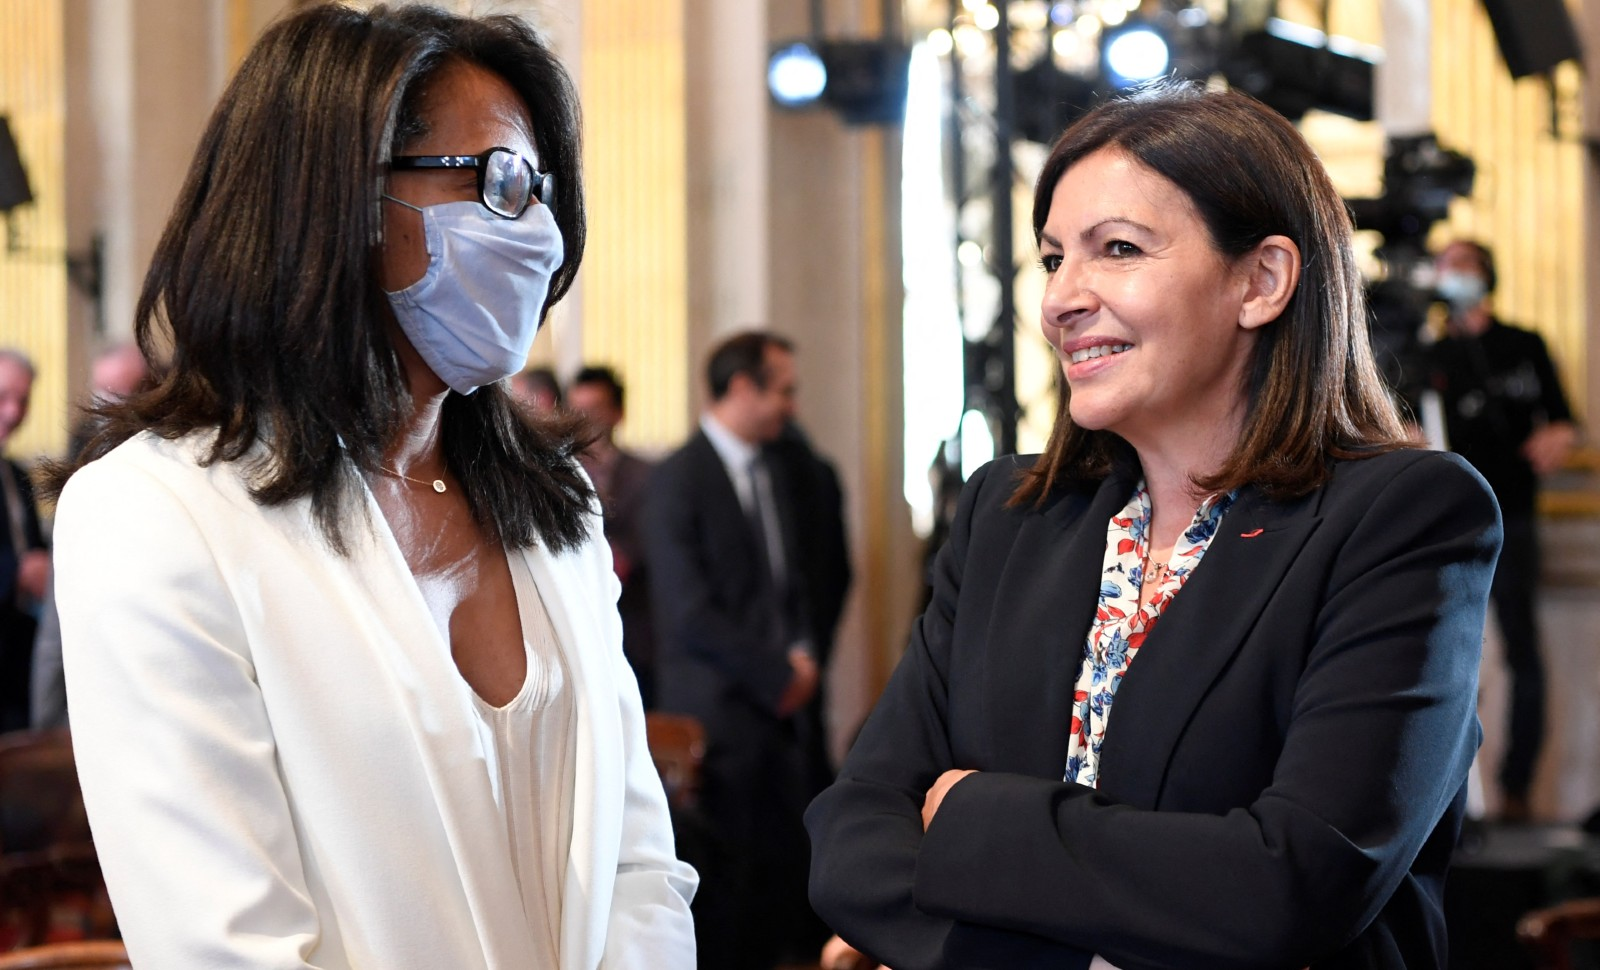 Audrey Pulvar et Anne Hidalgo, mars 2020 © BERTRAND GUAY / AFP